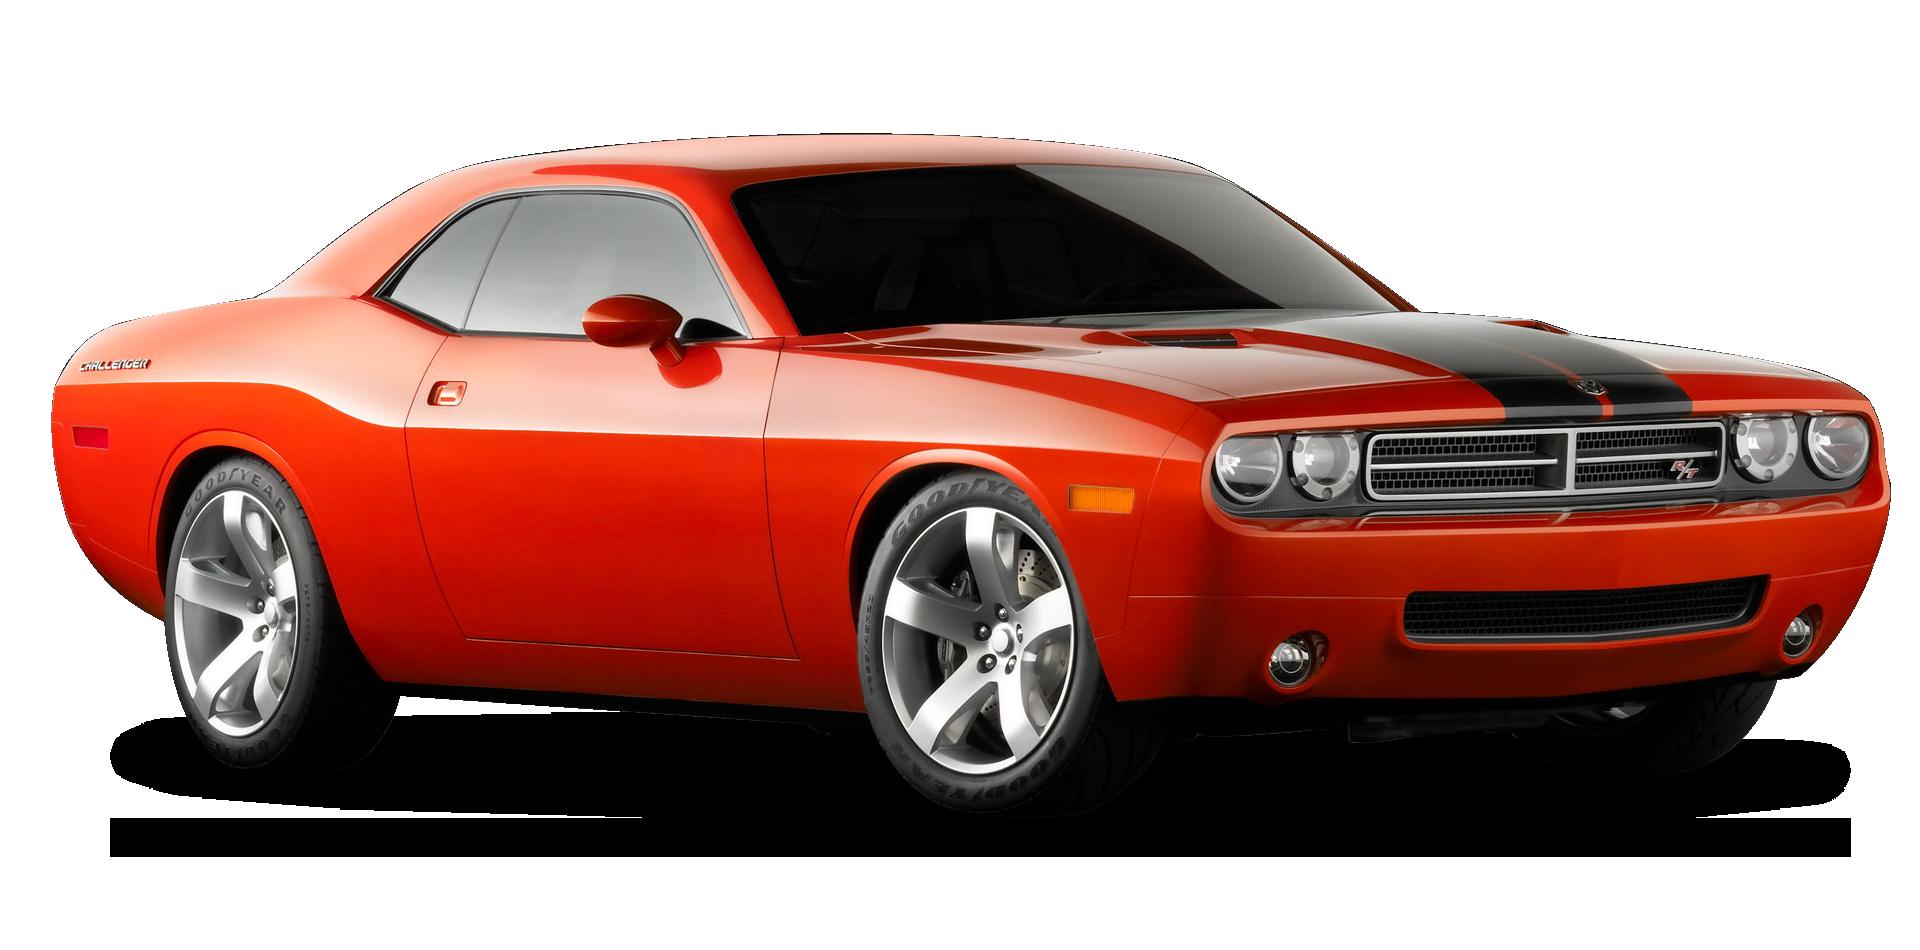 Mathews Family Motors Car Dealer In Kearney Mo